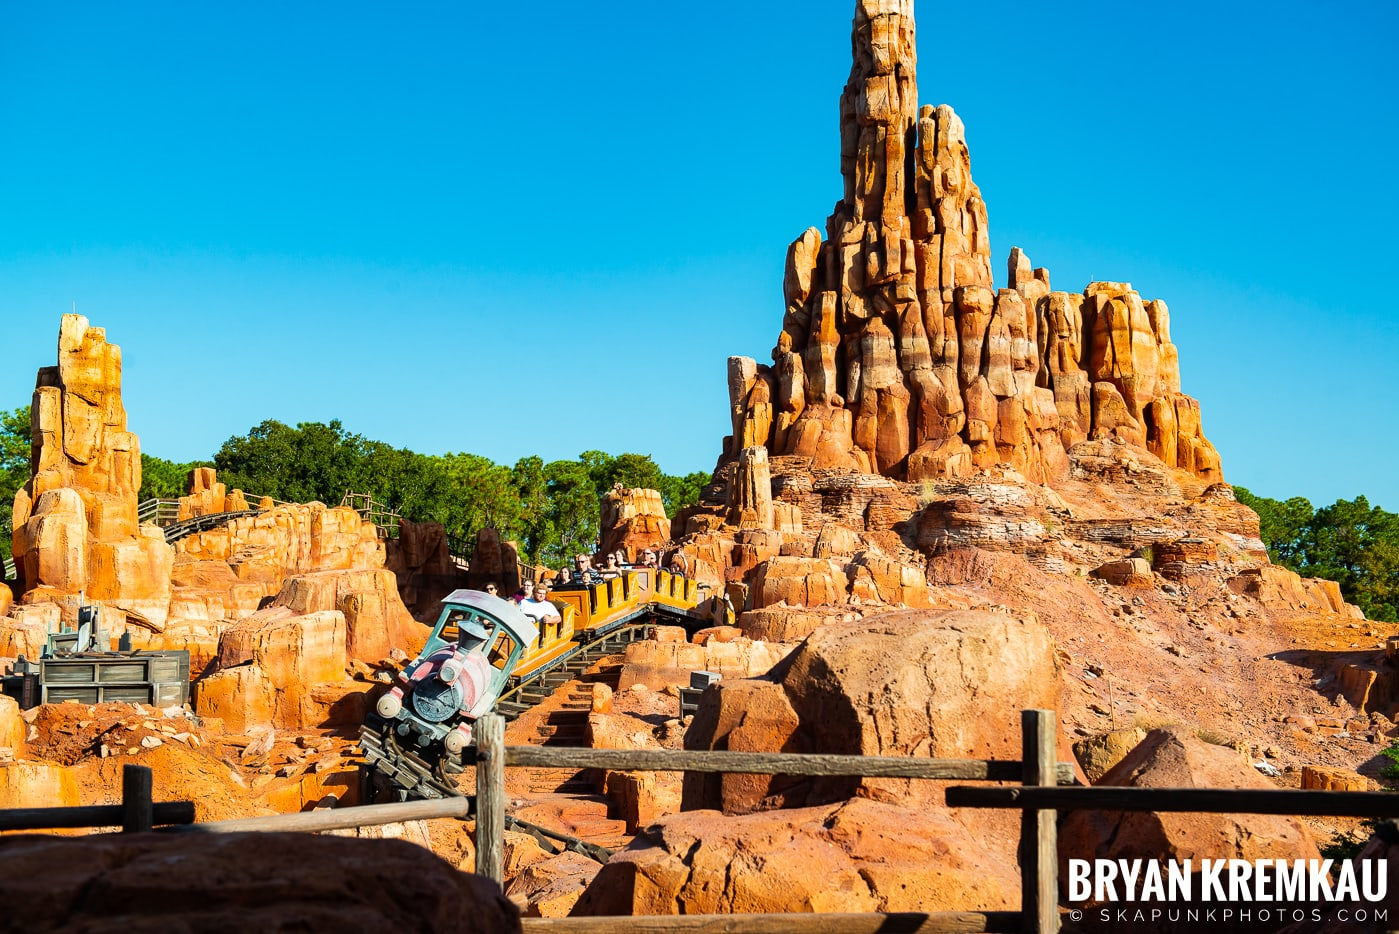 Walt Disney World Vacation: Day 6 (Magic Kingdom, Epcot, Disney's Hollywood Studios) - 10.4.19 (33)